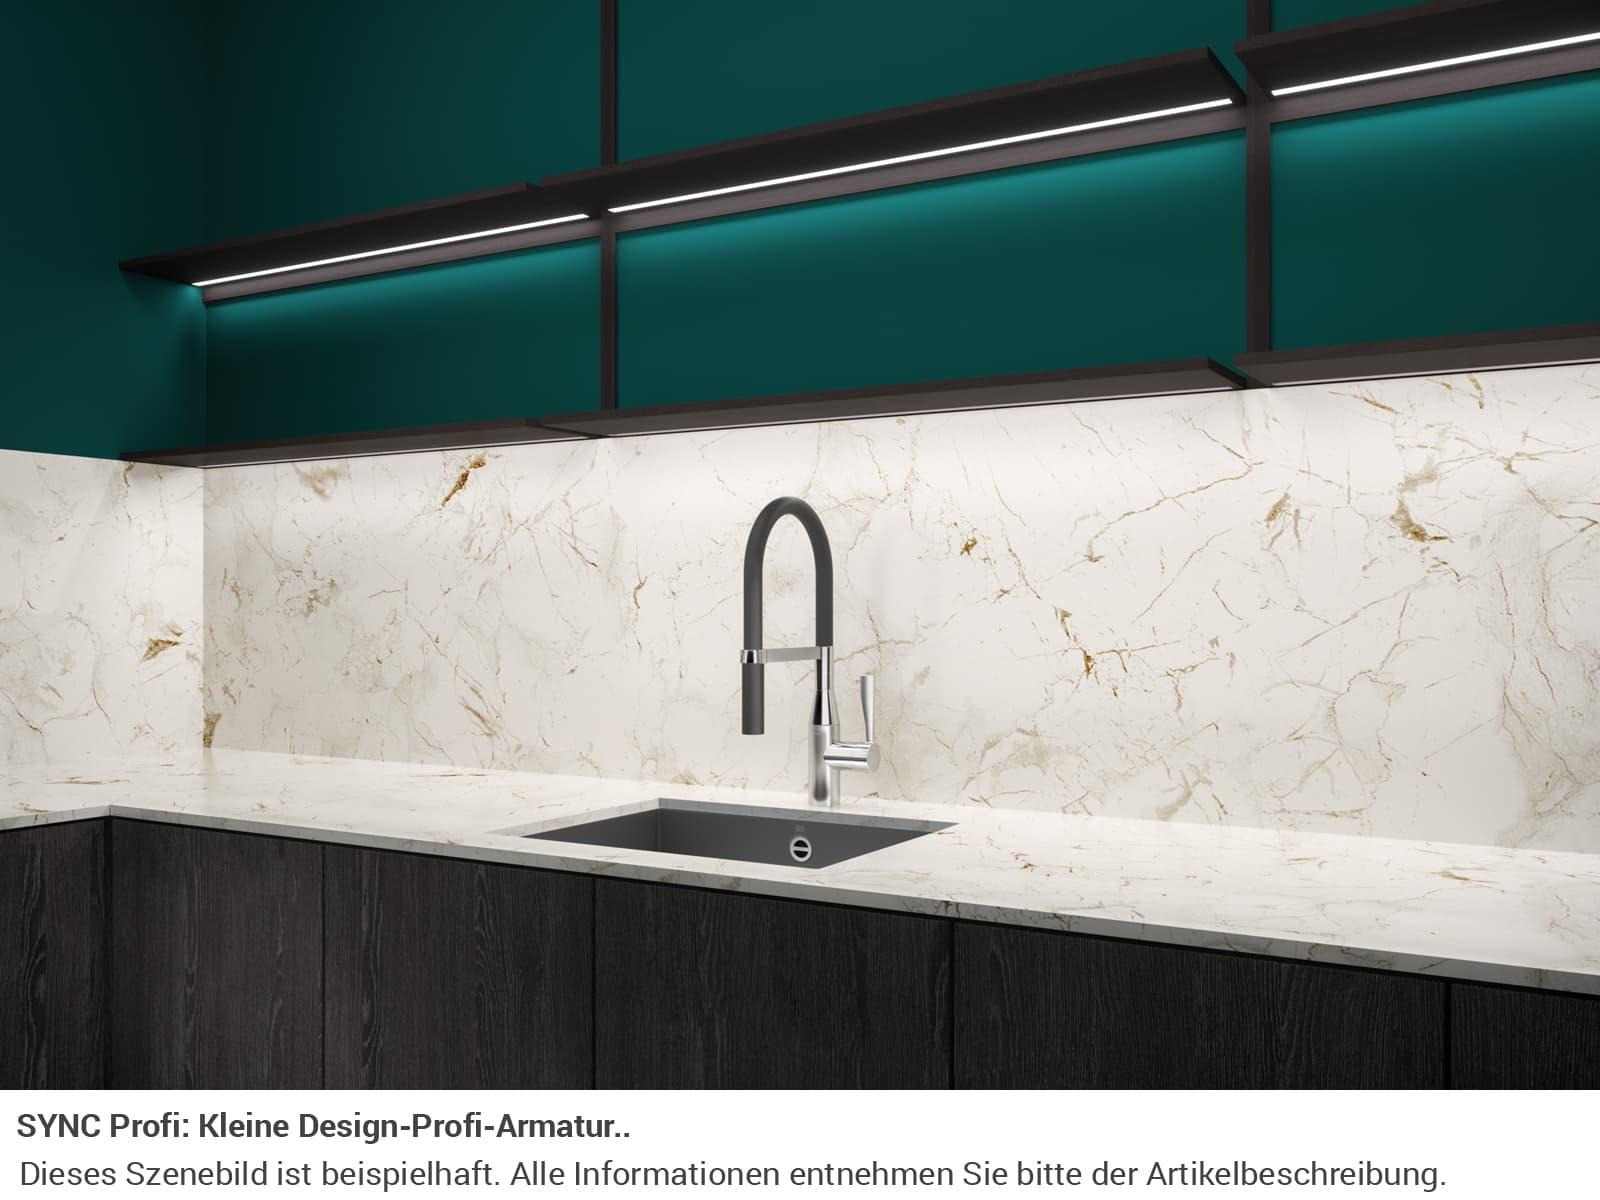 Dornbracht Sync Profi Dark Platinum Matt 33 865 895-99 Hochdruckarmatur